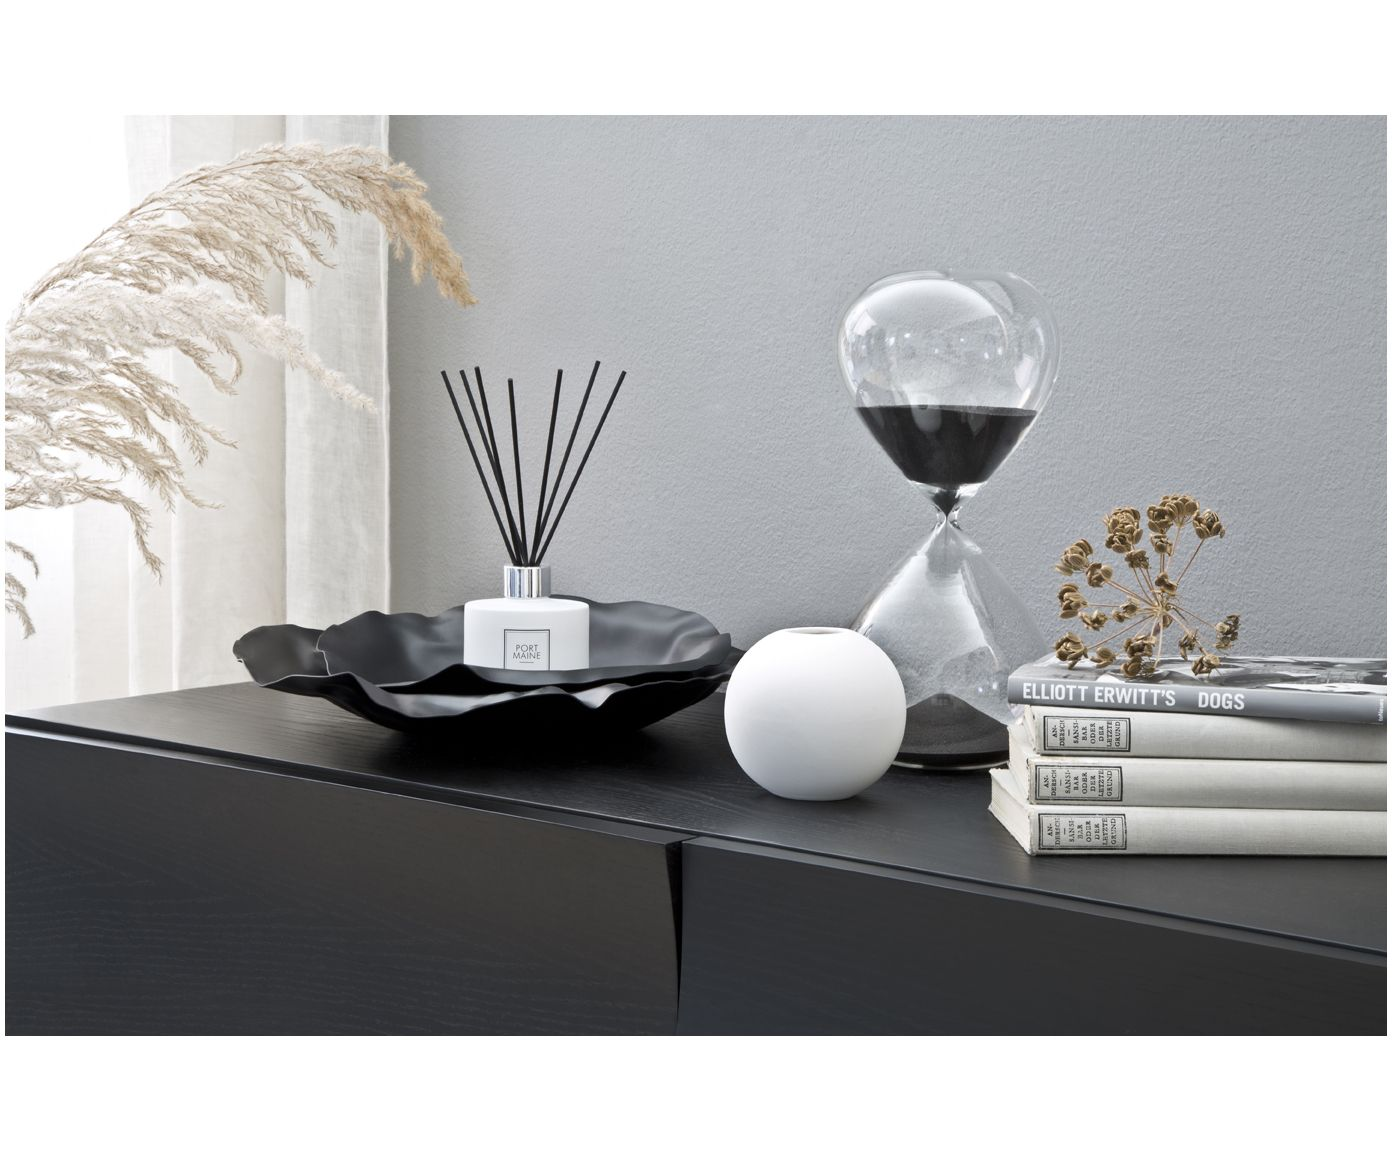 Sanduhr Deko.Affiliatelink Sanduhr Ball Skandinavisches Design